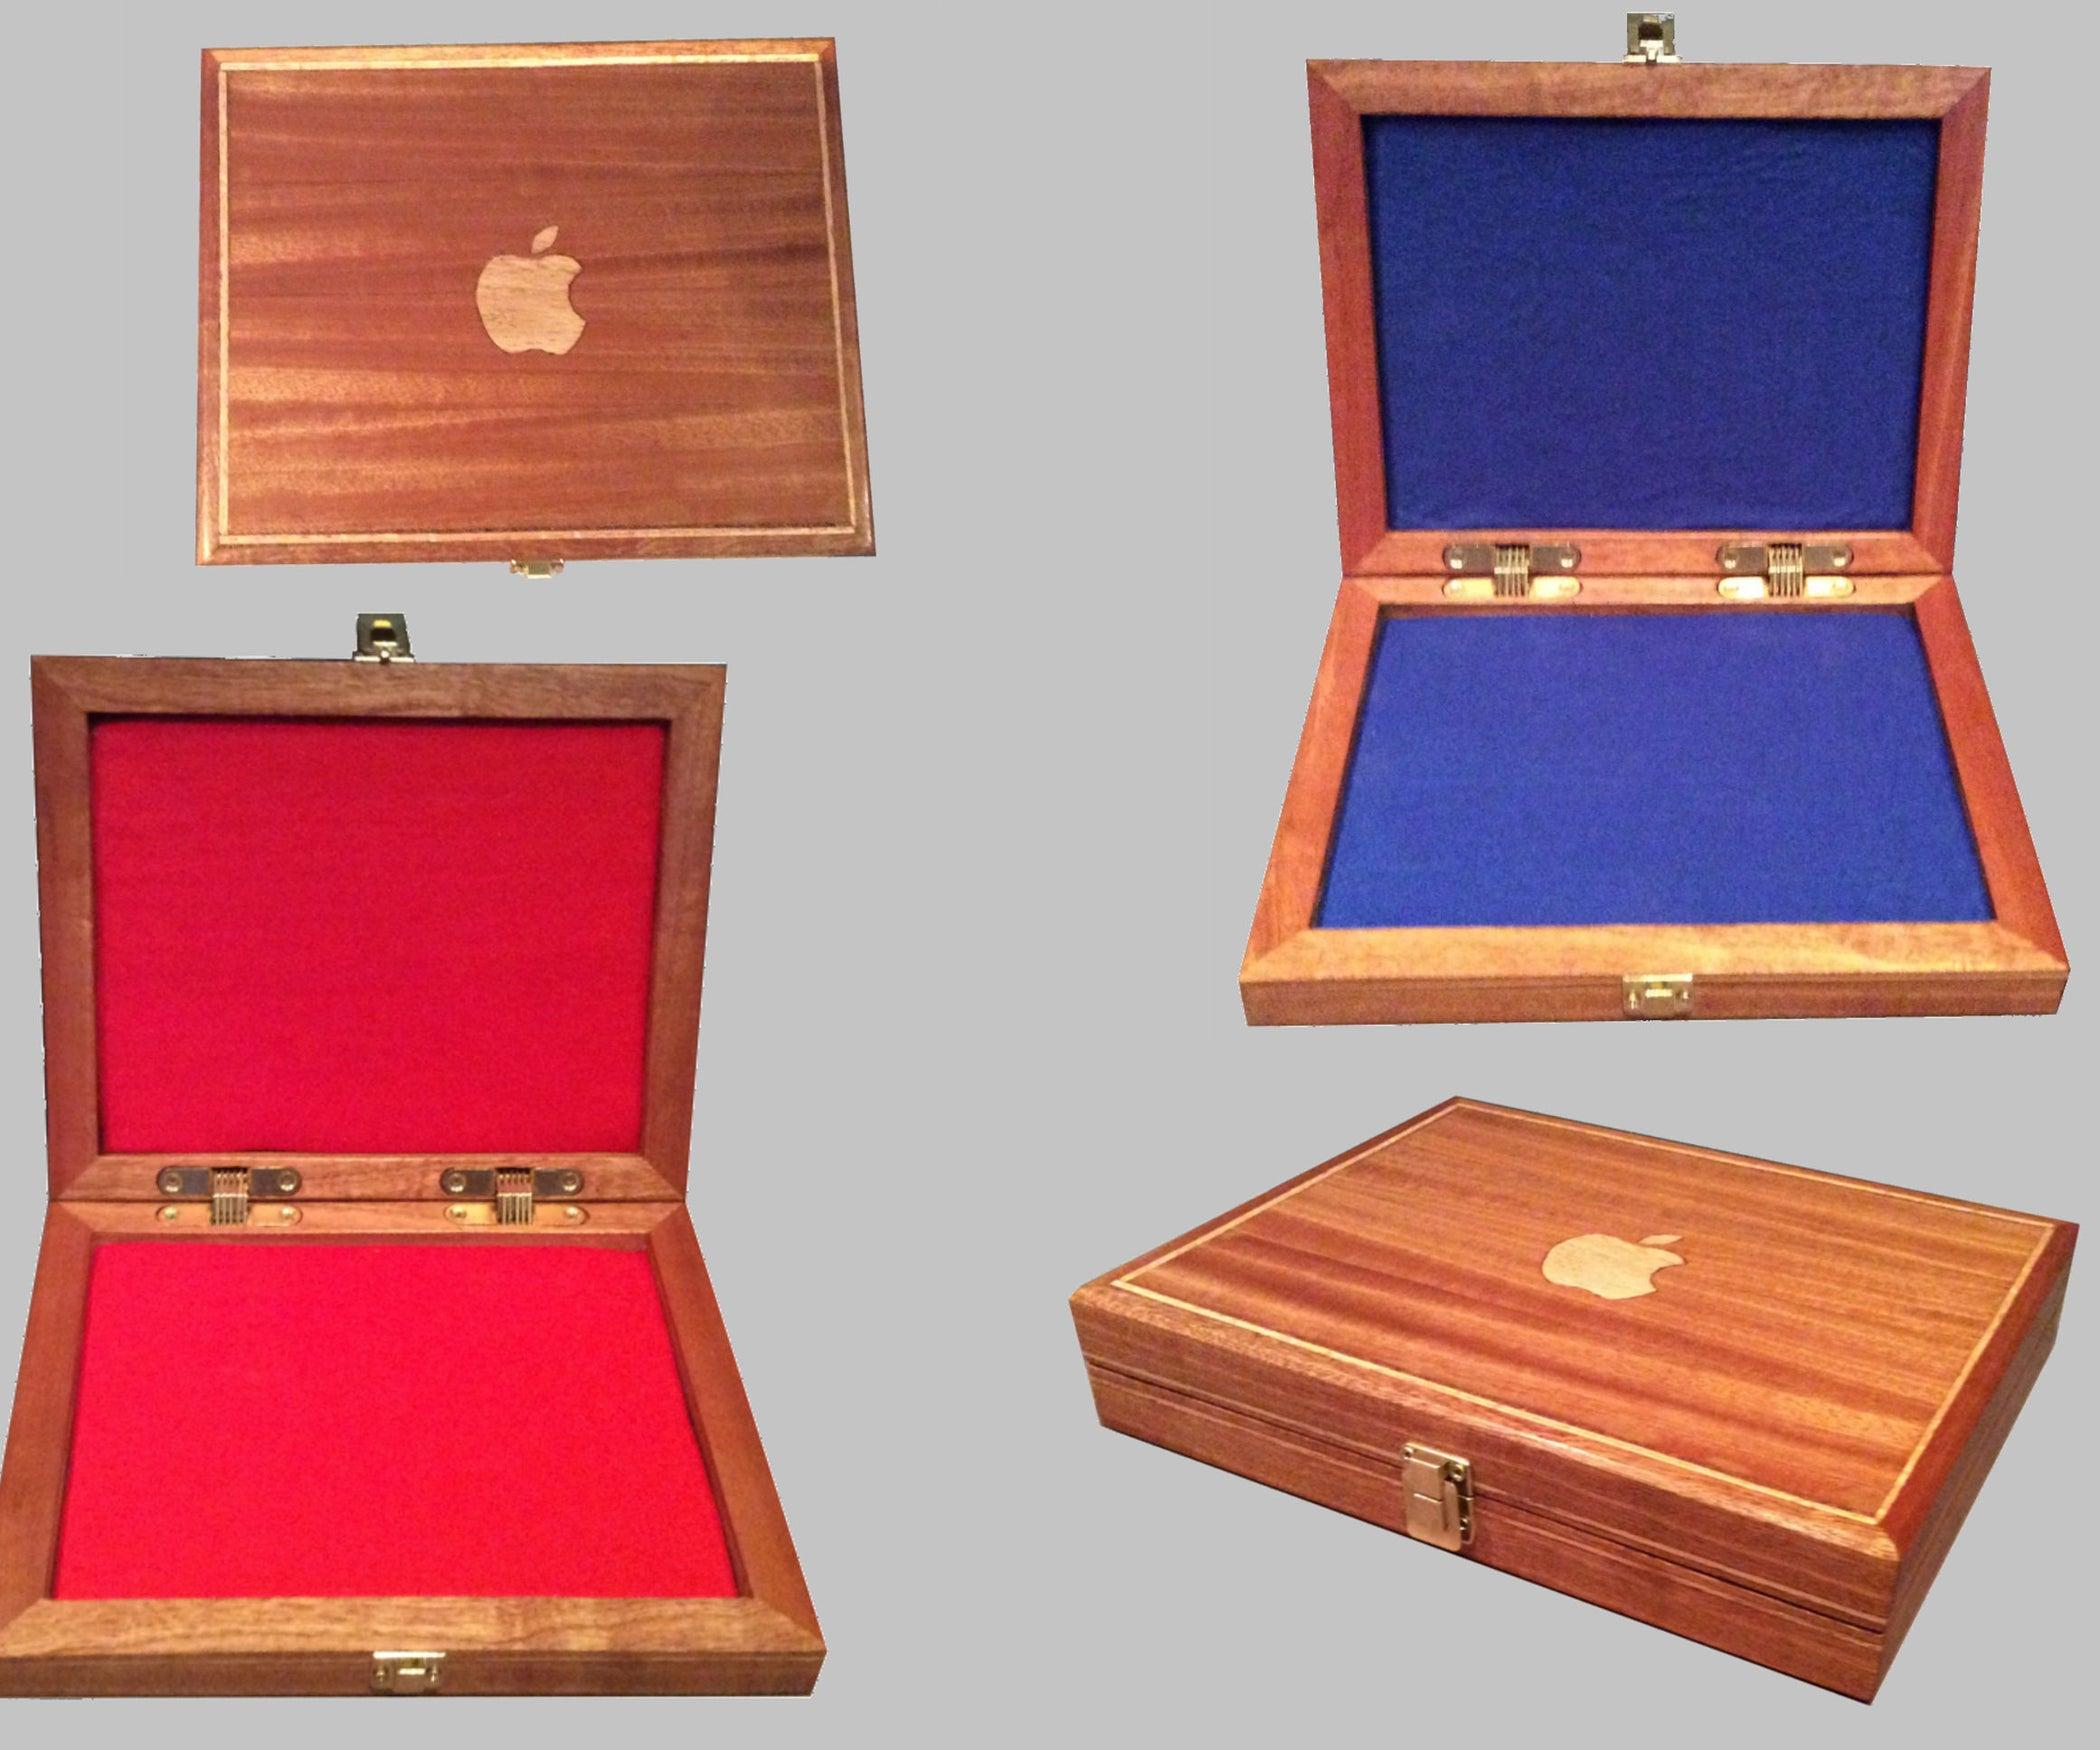 Wooden Apple IPad Protective Box